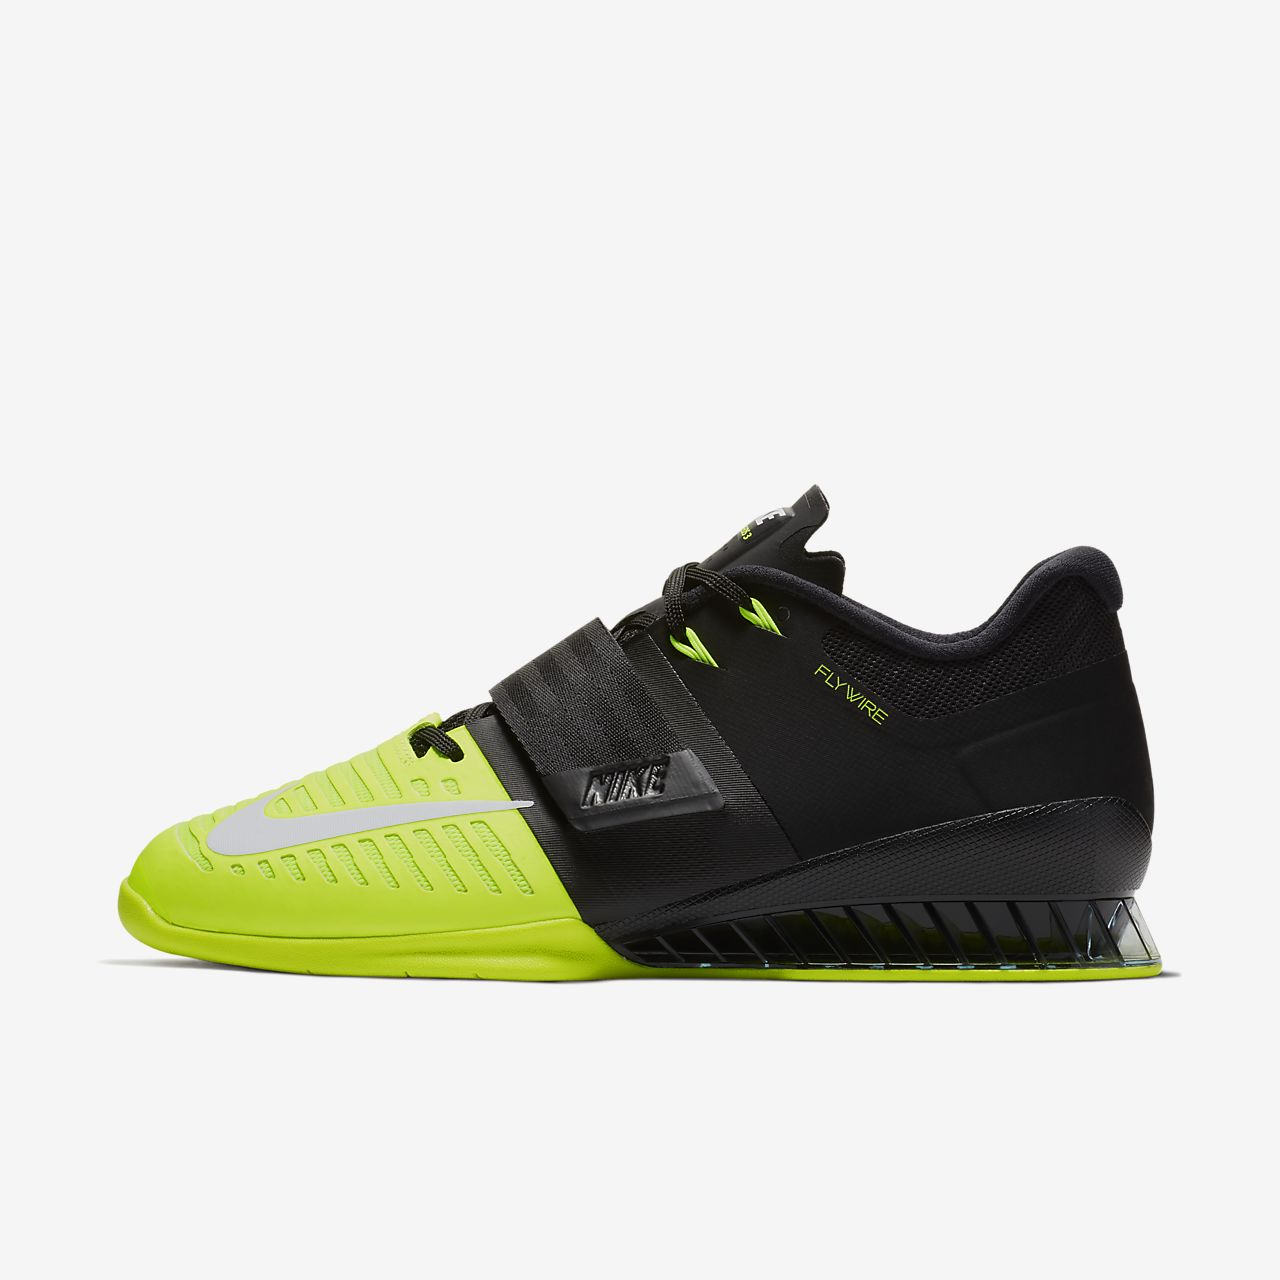 Nike Vol Bonafide - Chaussures - High-tops Et Baskets Nike 2wmLc1D9